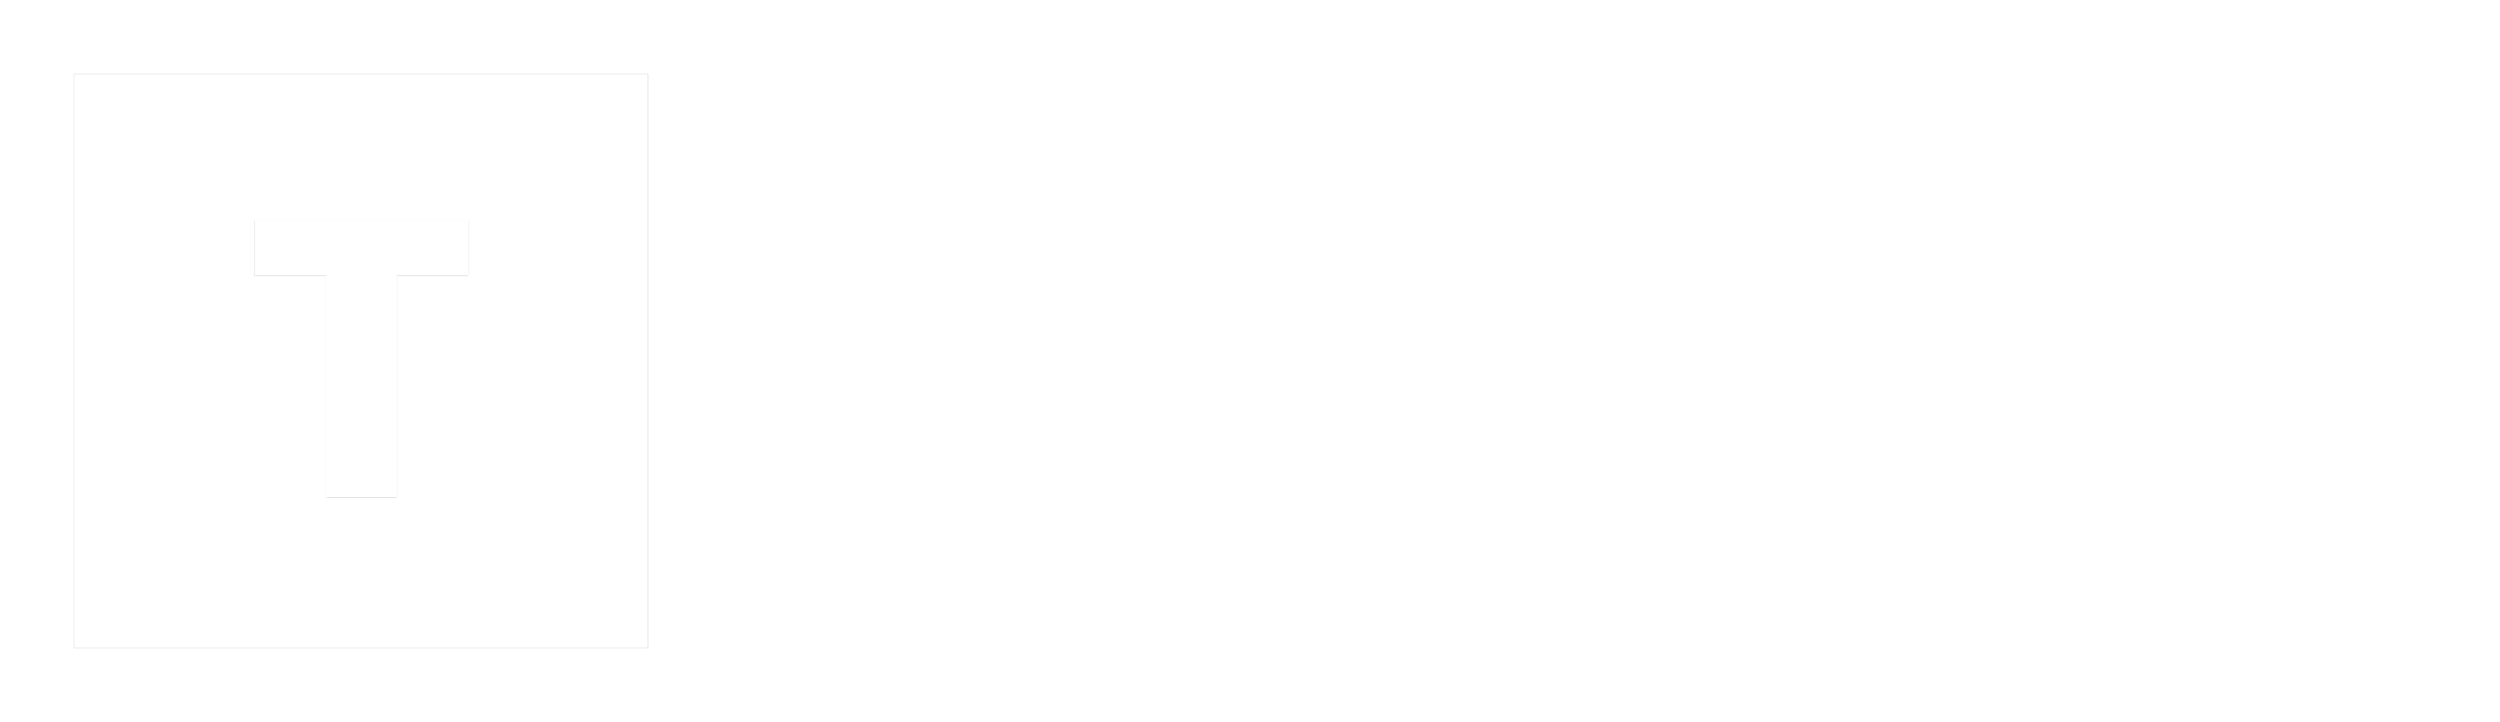 TheTrillionsCo-logo.png